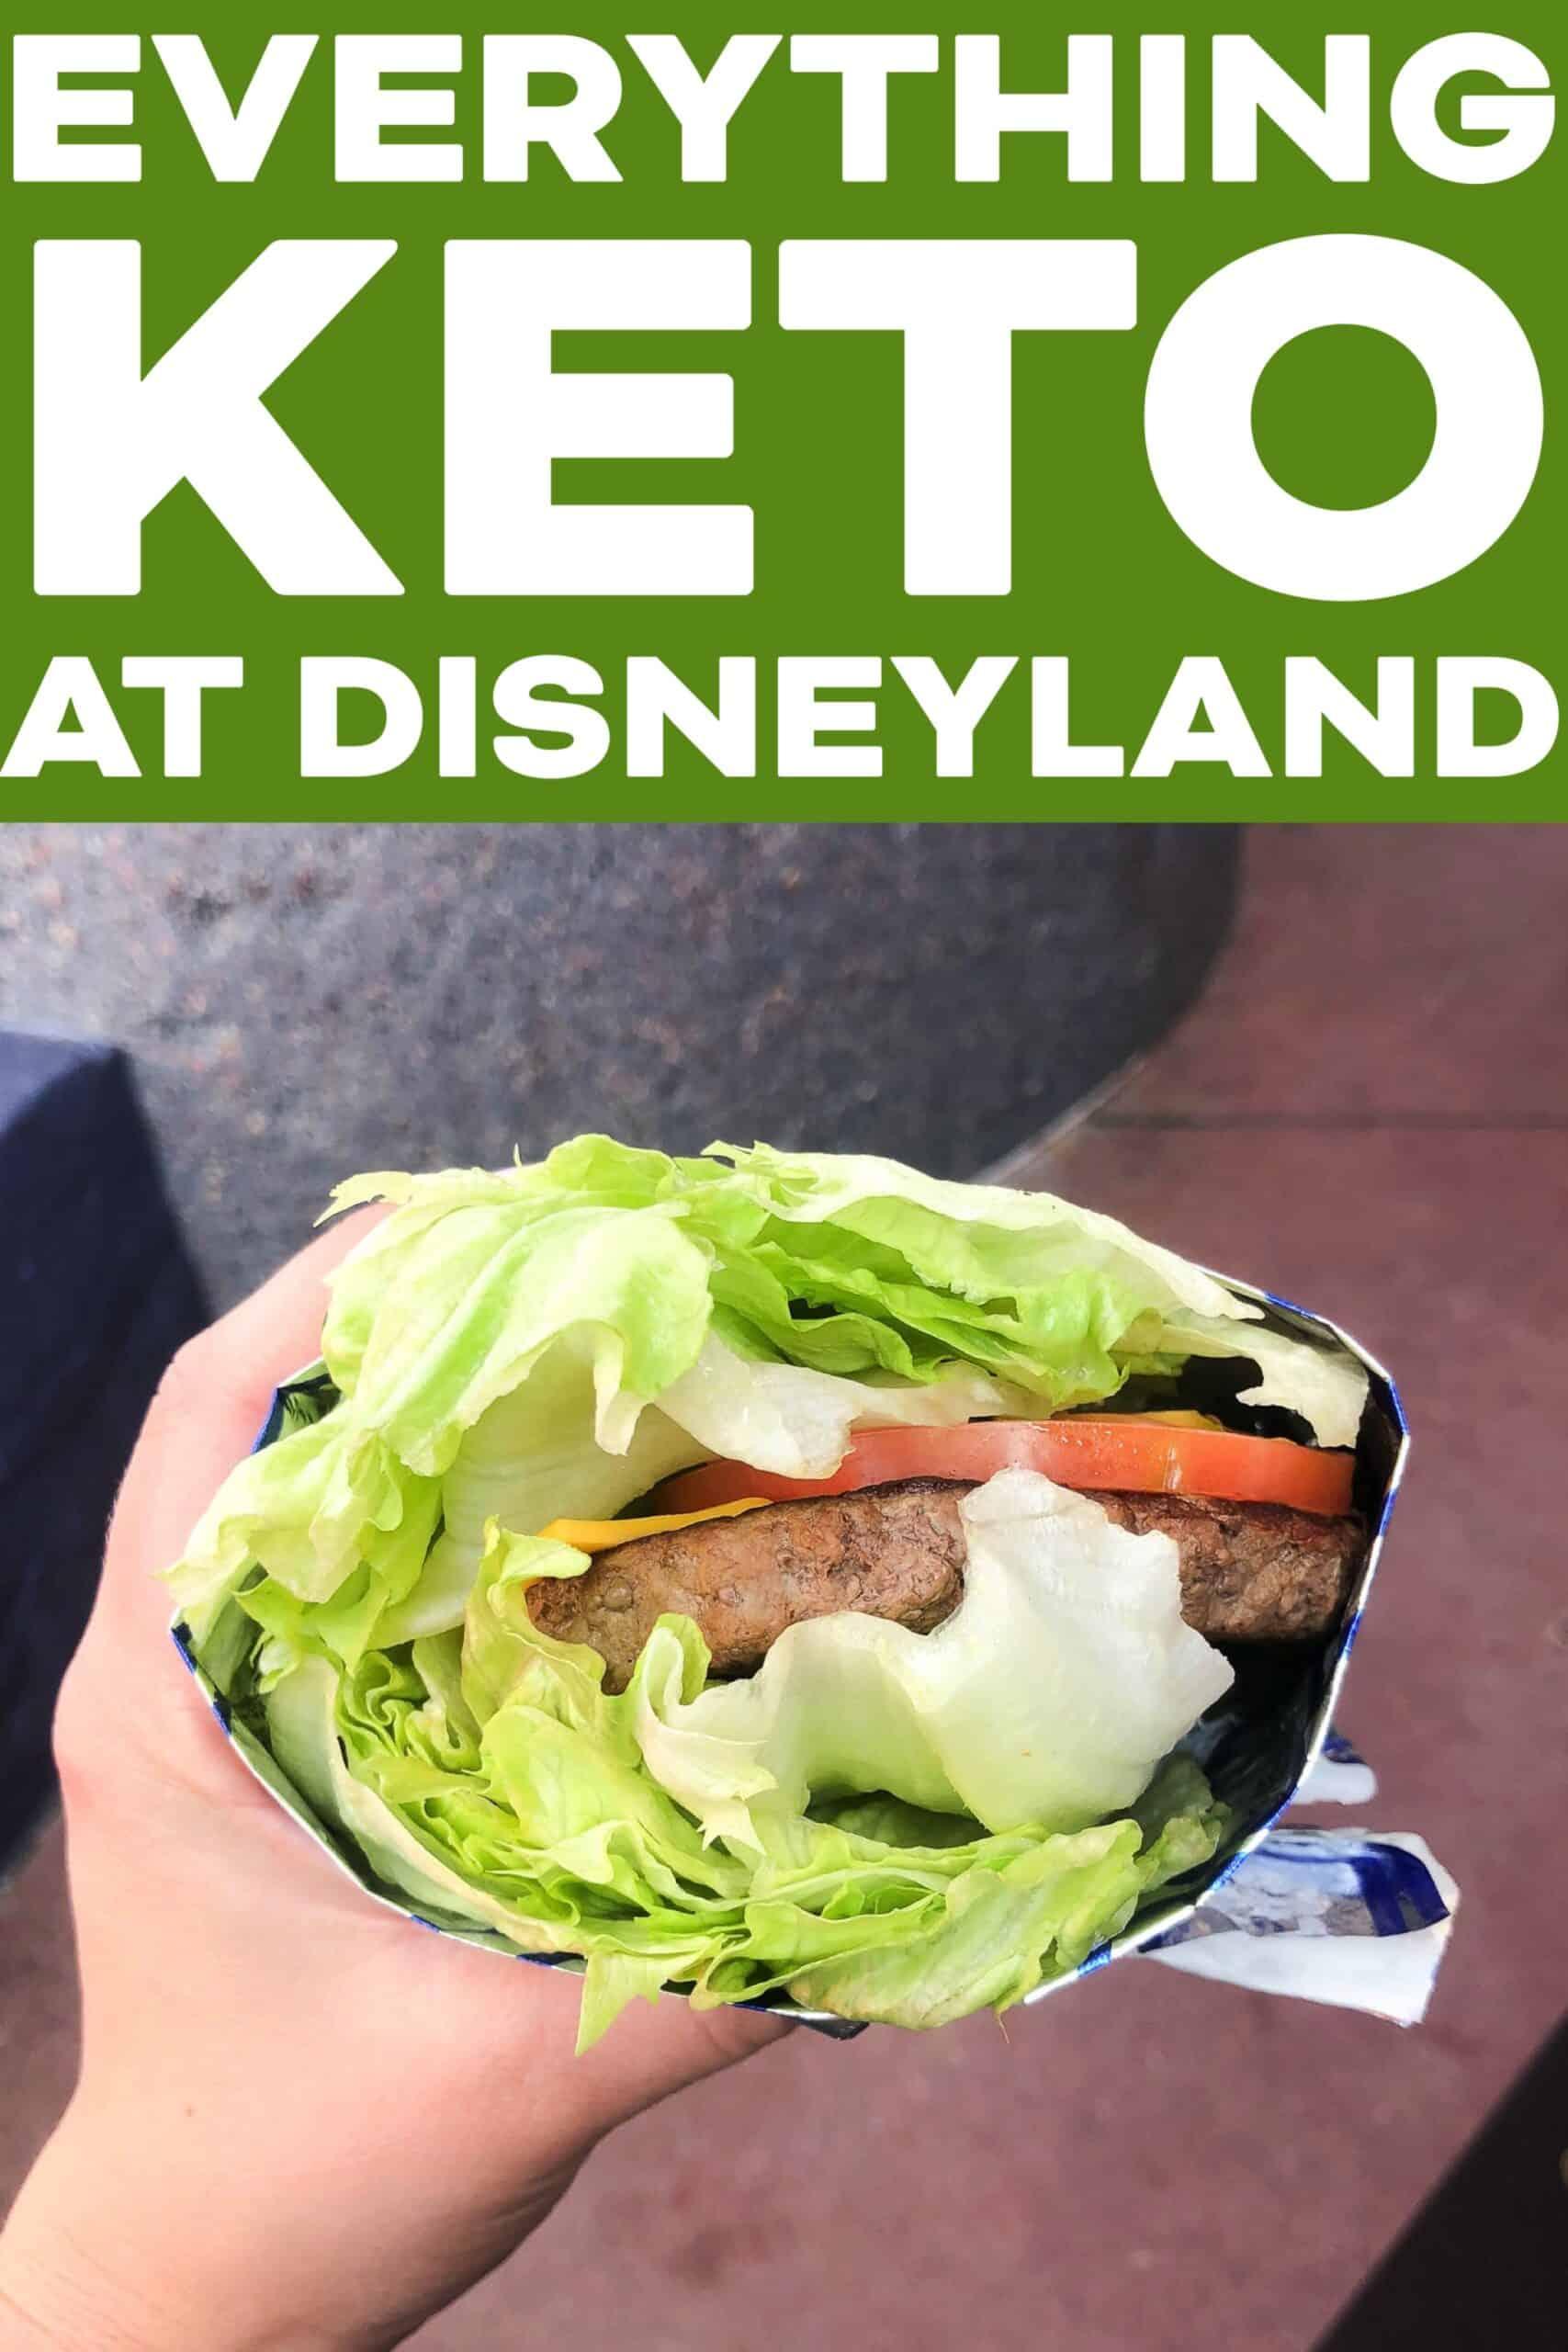 lettuce wrapped burger at Disneyland